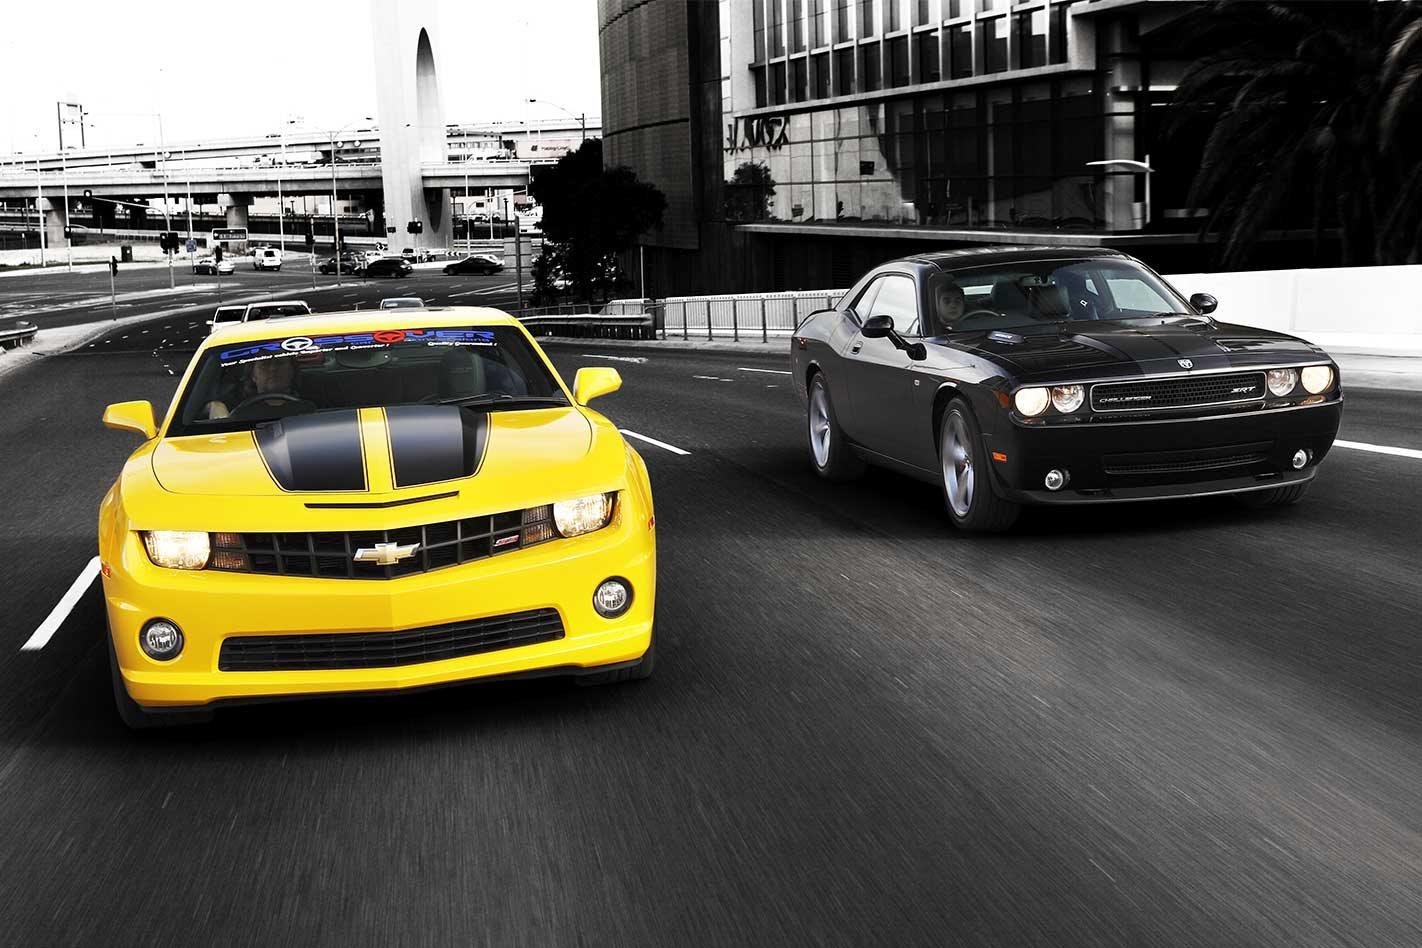 Kelebihan Kekurangan Chevrolet Challenger Harga